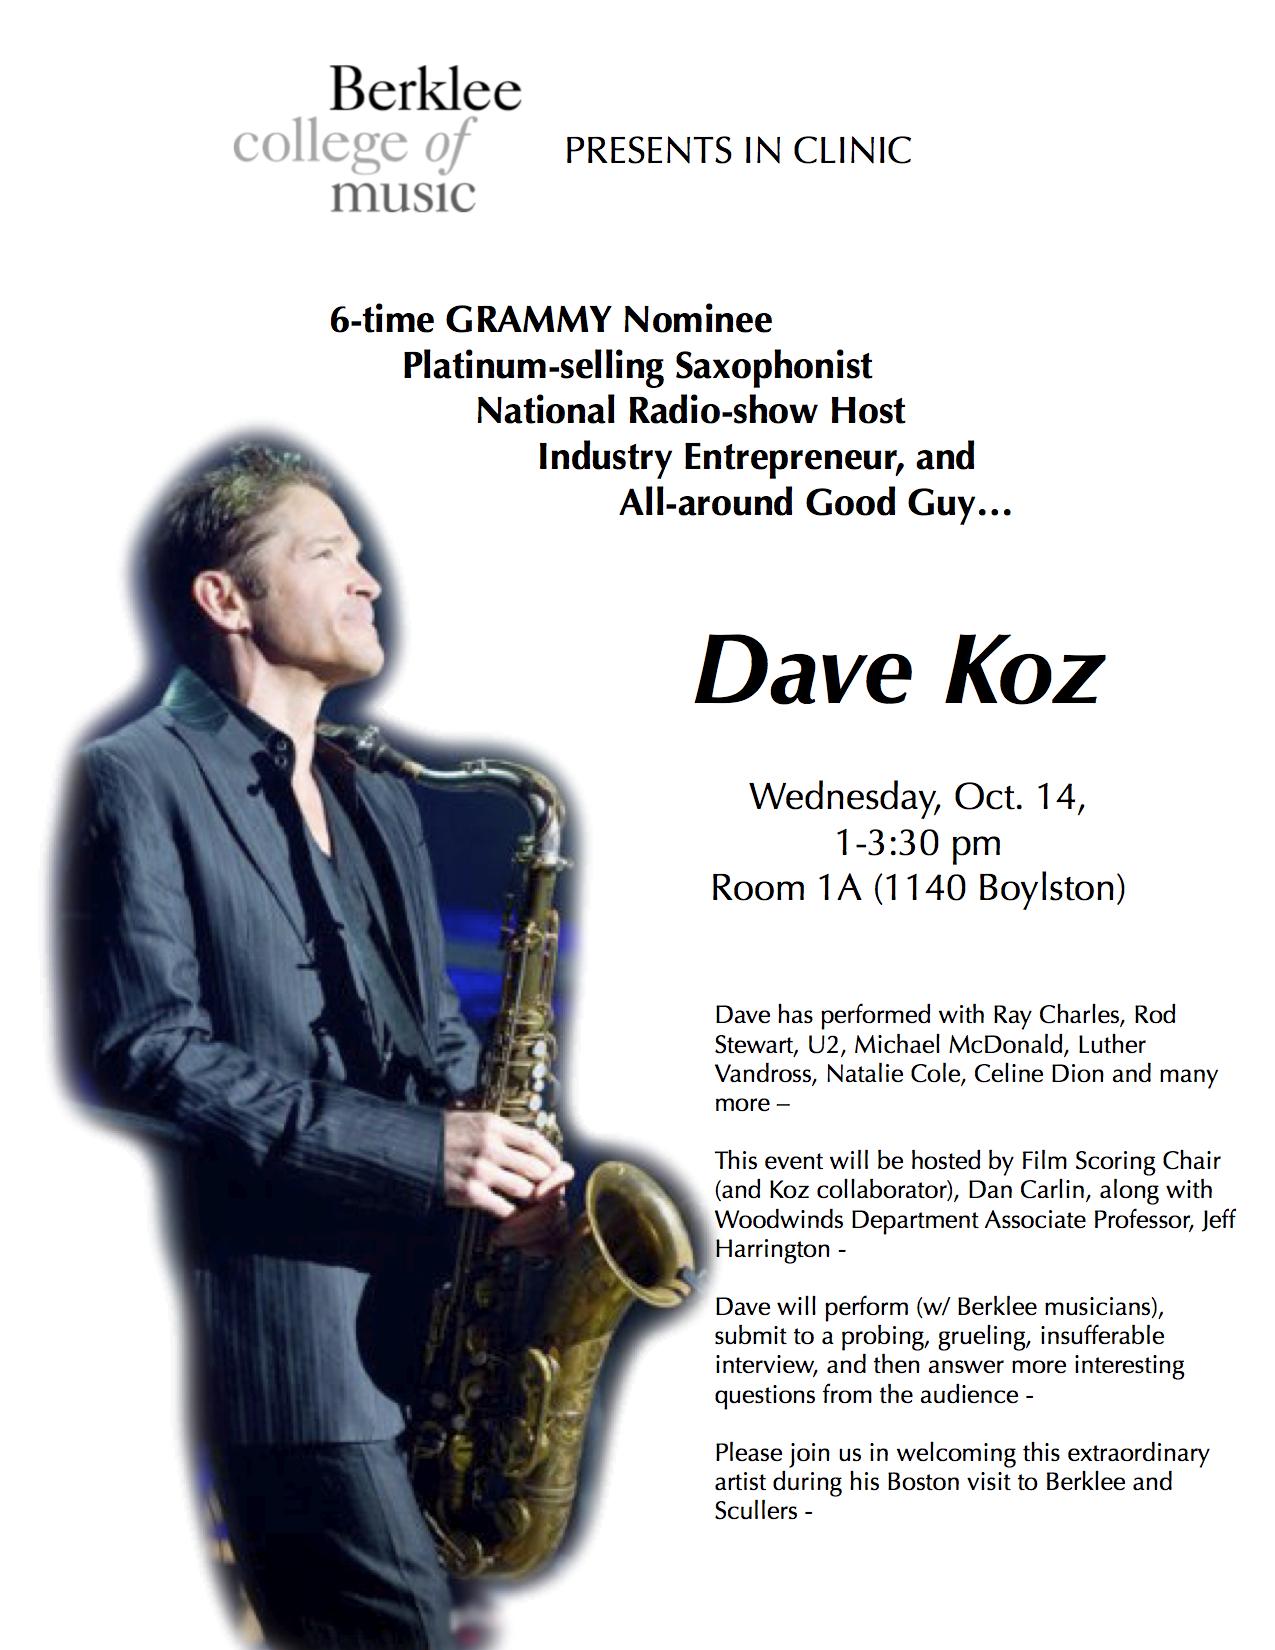 Hosting a clinic for Dave Koz at Berklee